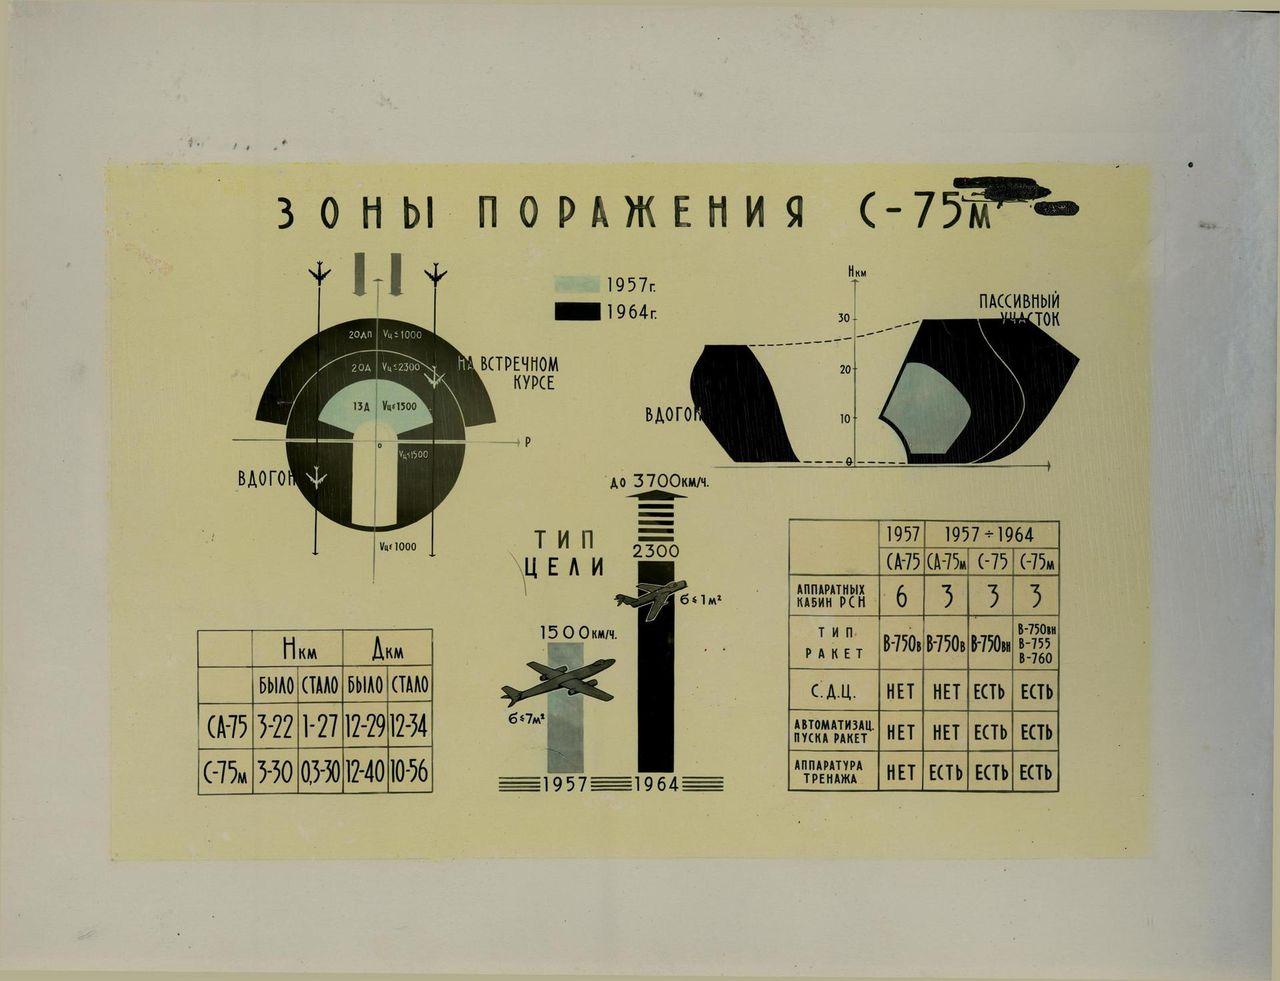 http://popgun.ru/files/g/71/orig/7167010.jpg